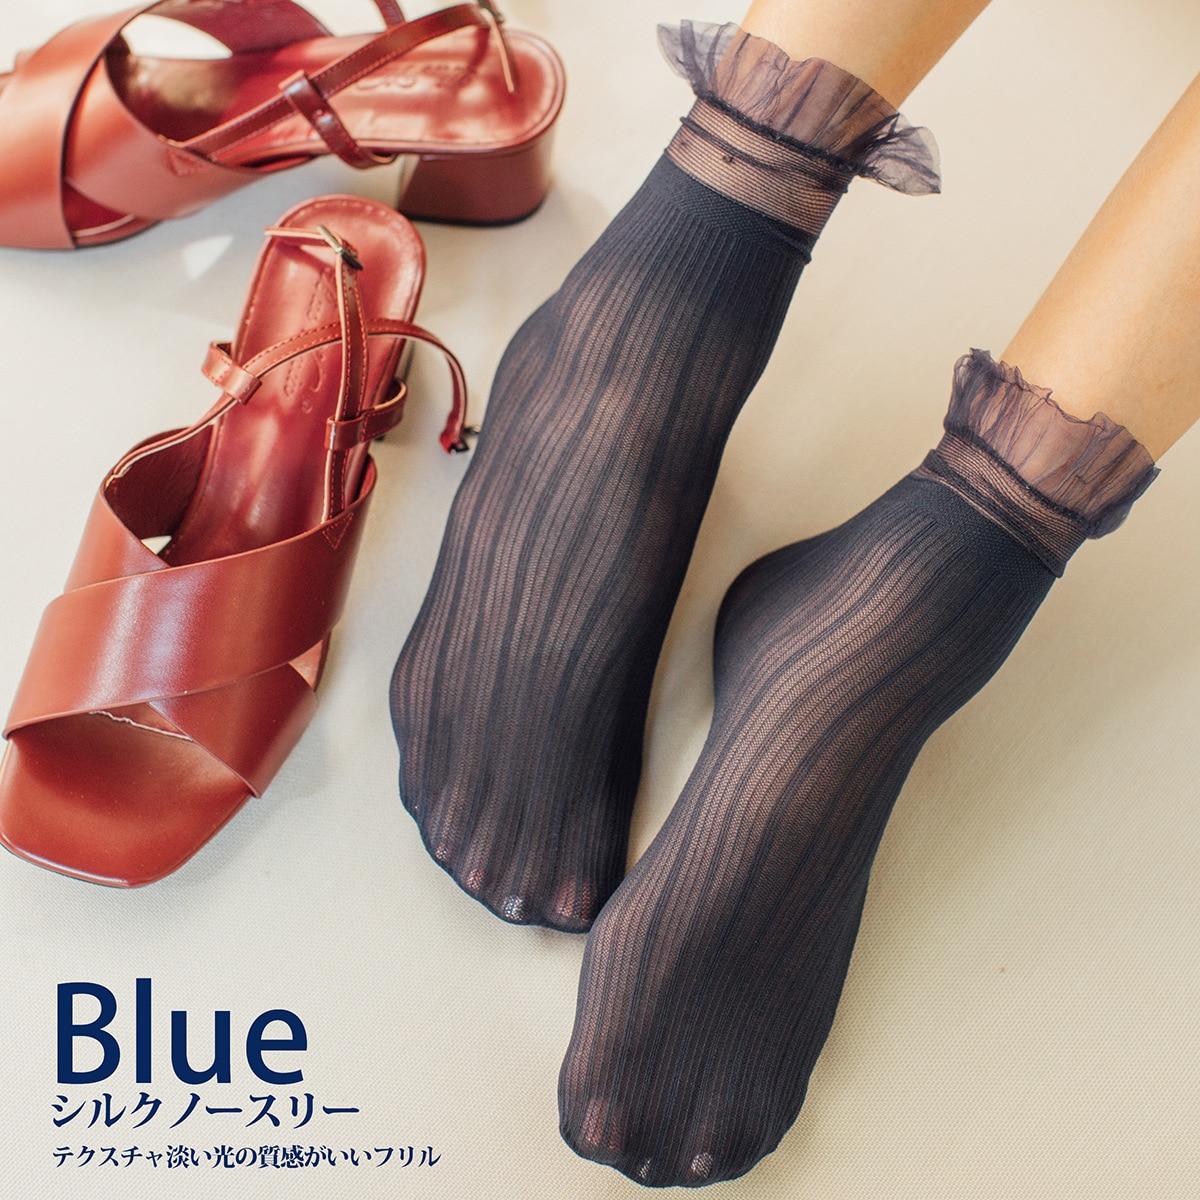 1 Pair Fashion Kawaii Women Socks Lace Ultra-Thin Transparent Silk Socks Women Summer Spring Dropshipping